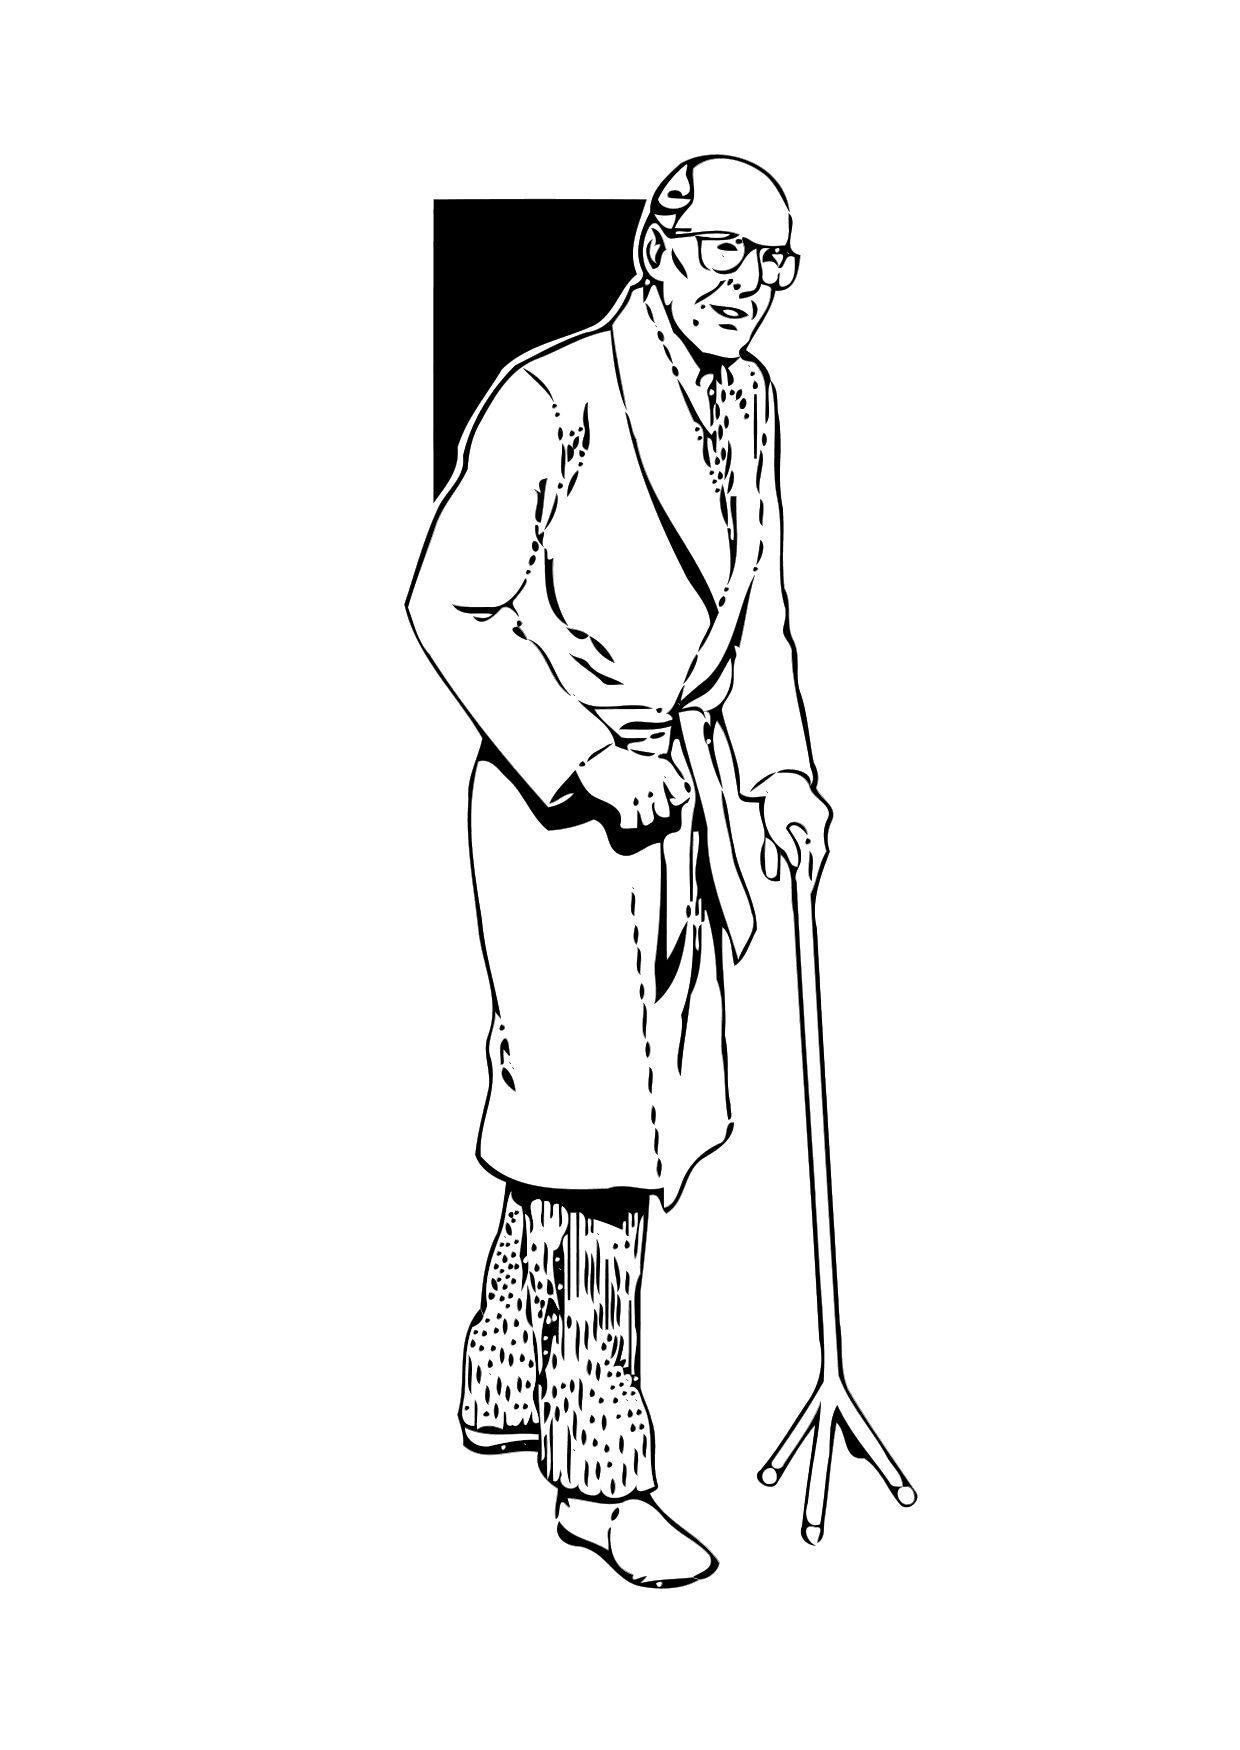 Dibujo para colorear Anciano